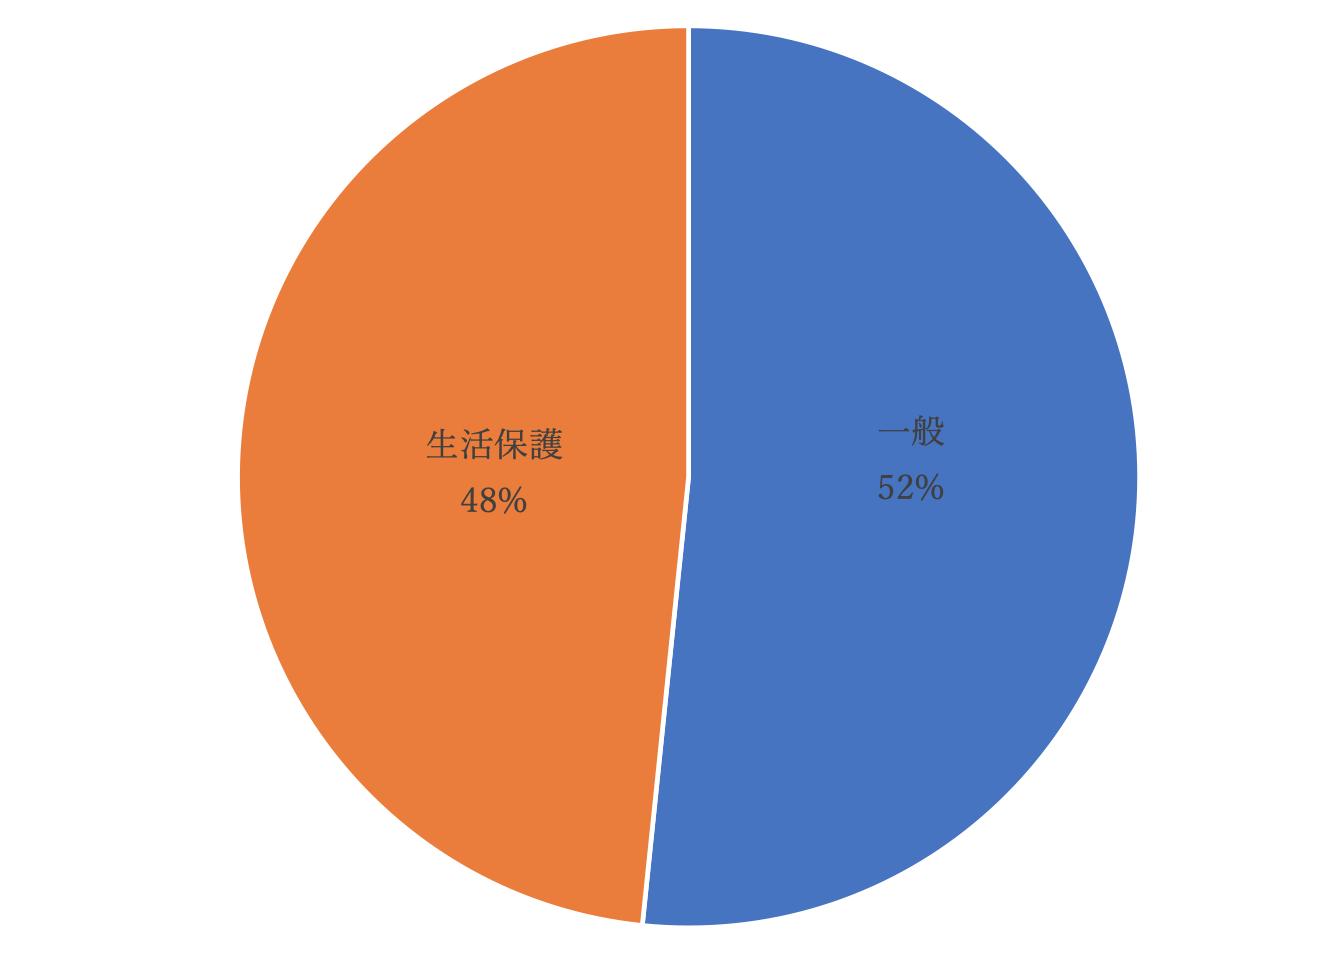 入居者の約半数は生活保護受給者